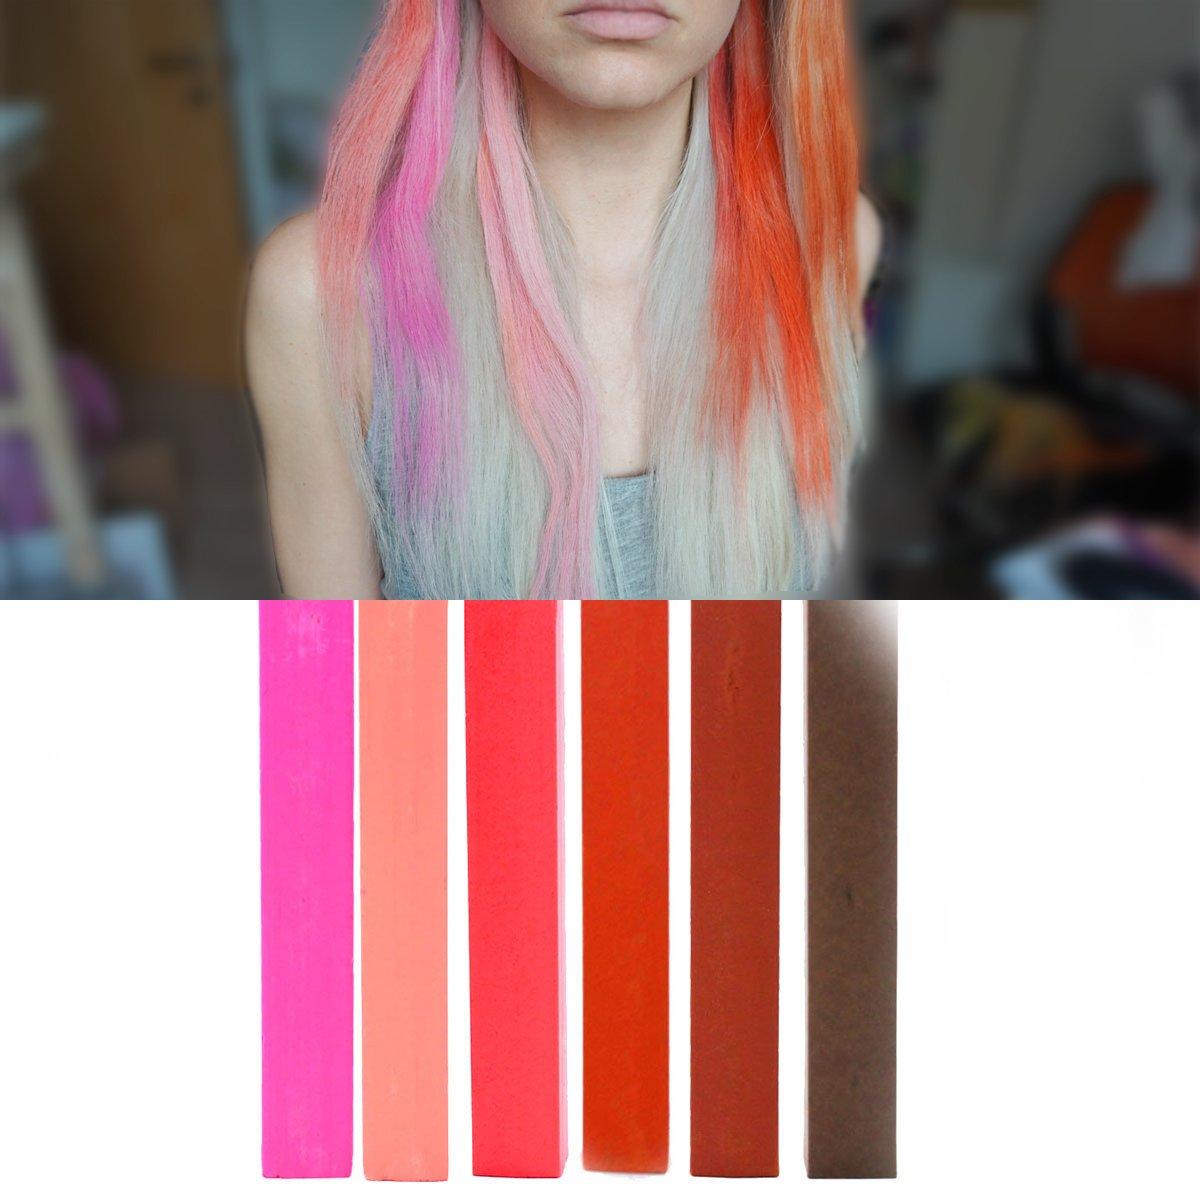 Buy Marsala Mix Hair Dye Set Of 6 Maroon Ombre Macaroons Reddish